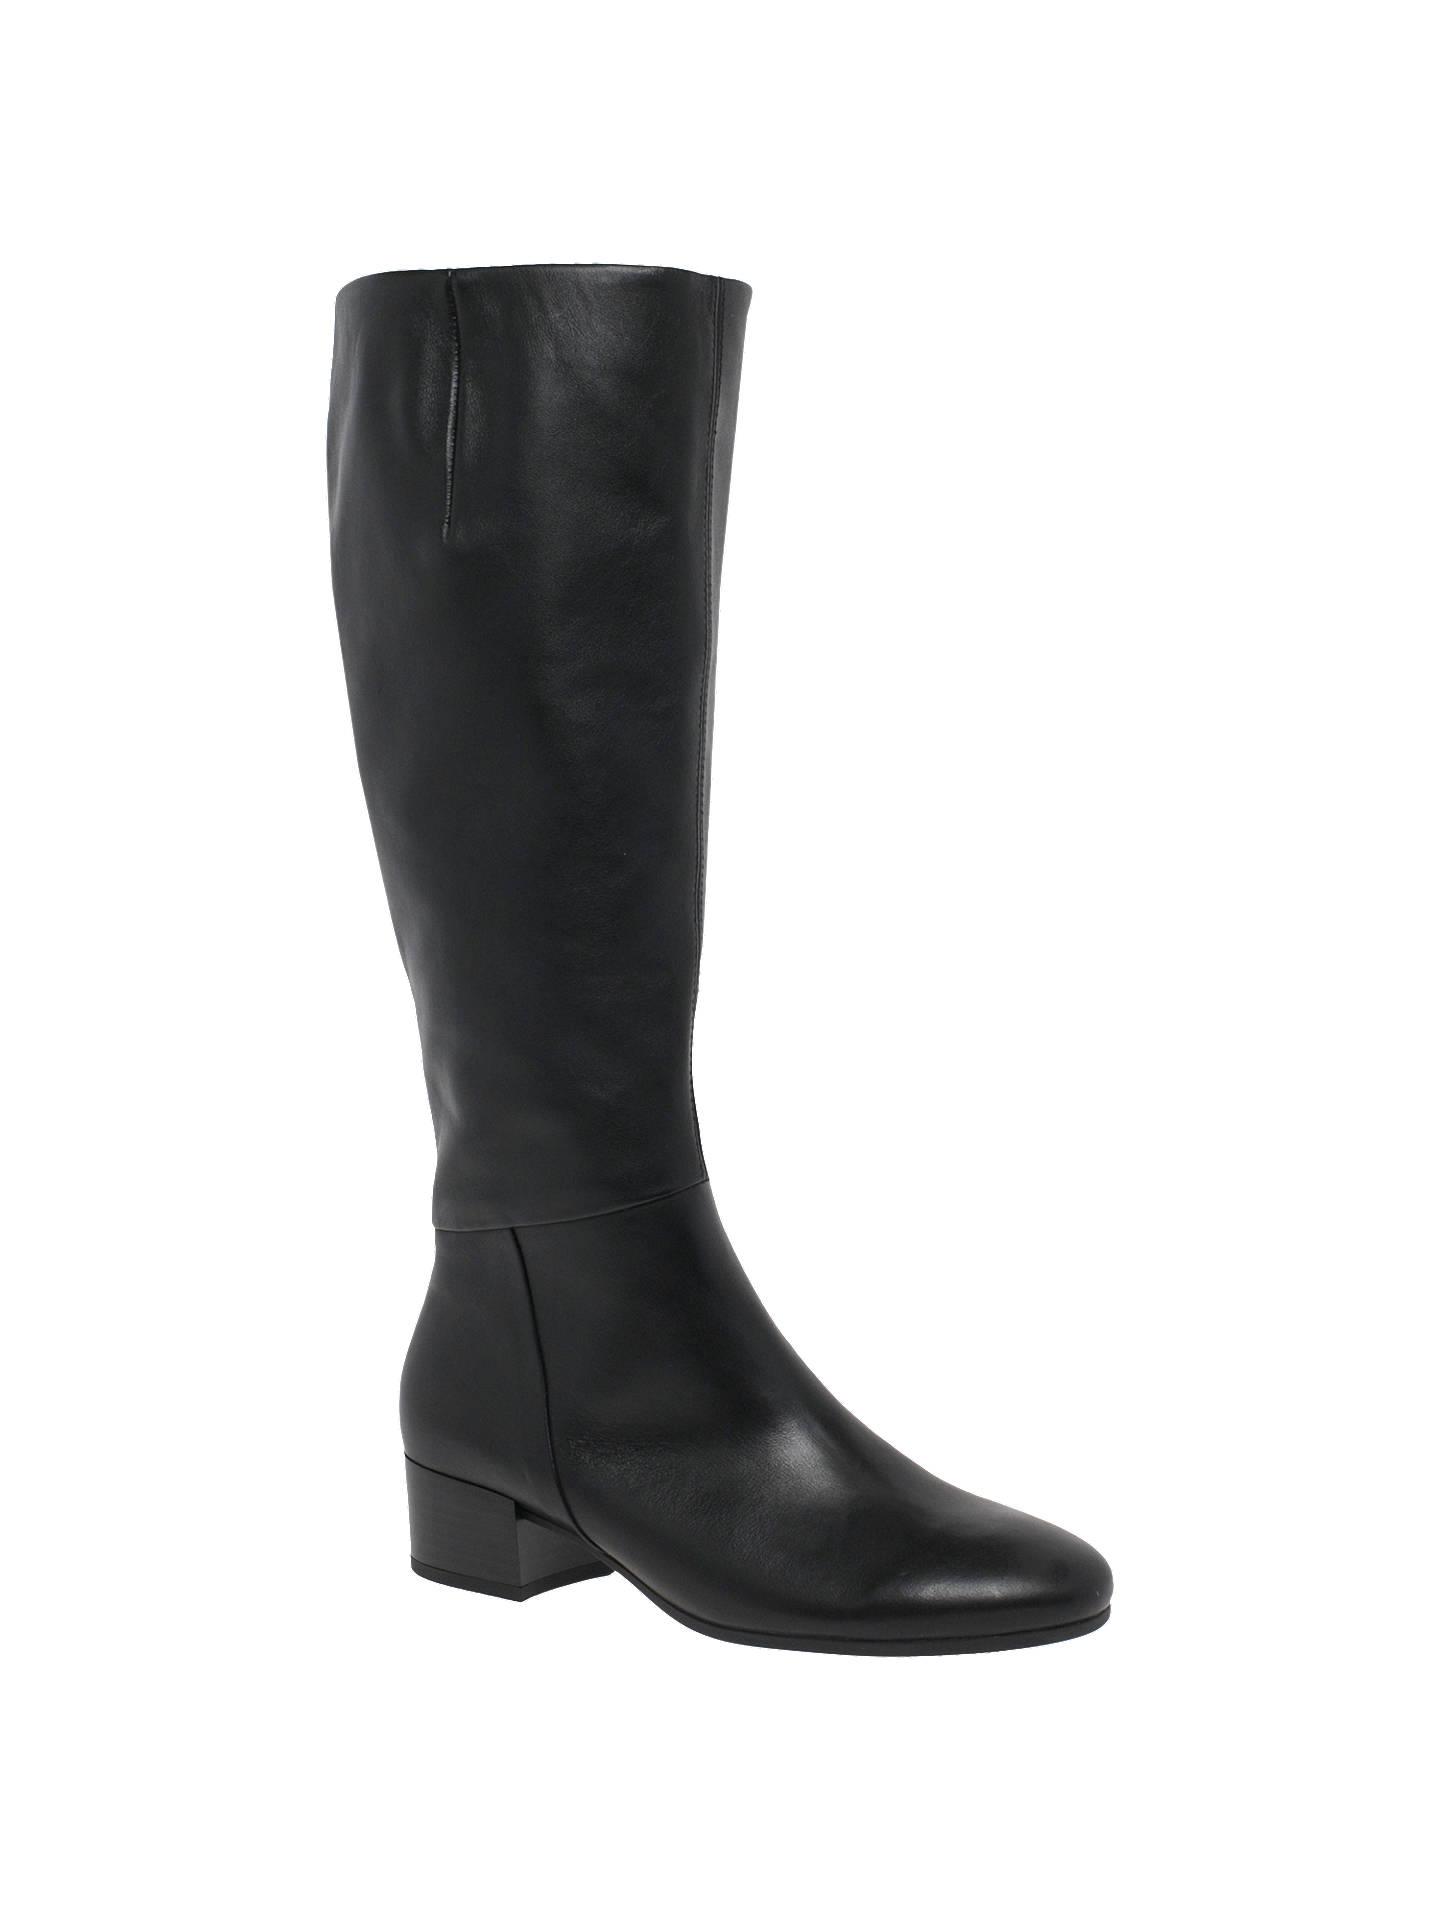 34e2fecd2ff Buy Gabor Cherry Extra Wide Block Heeled Knee High Boots